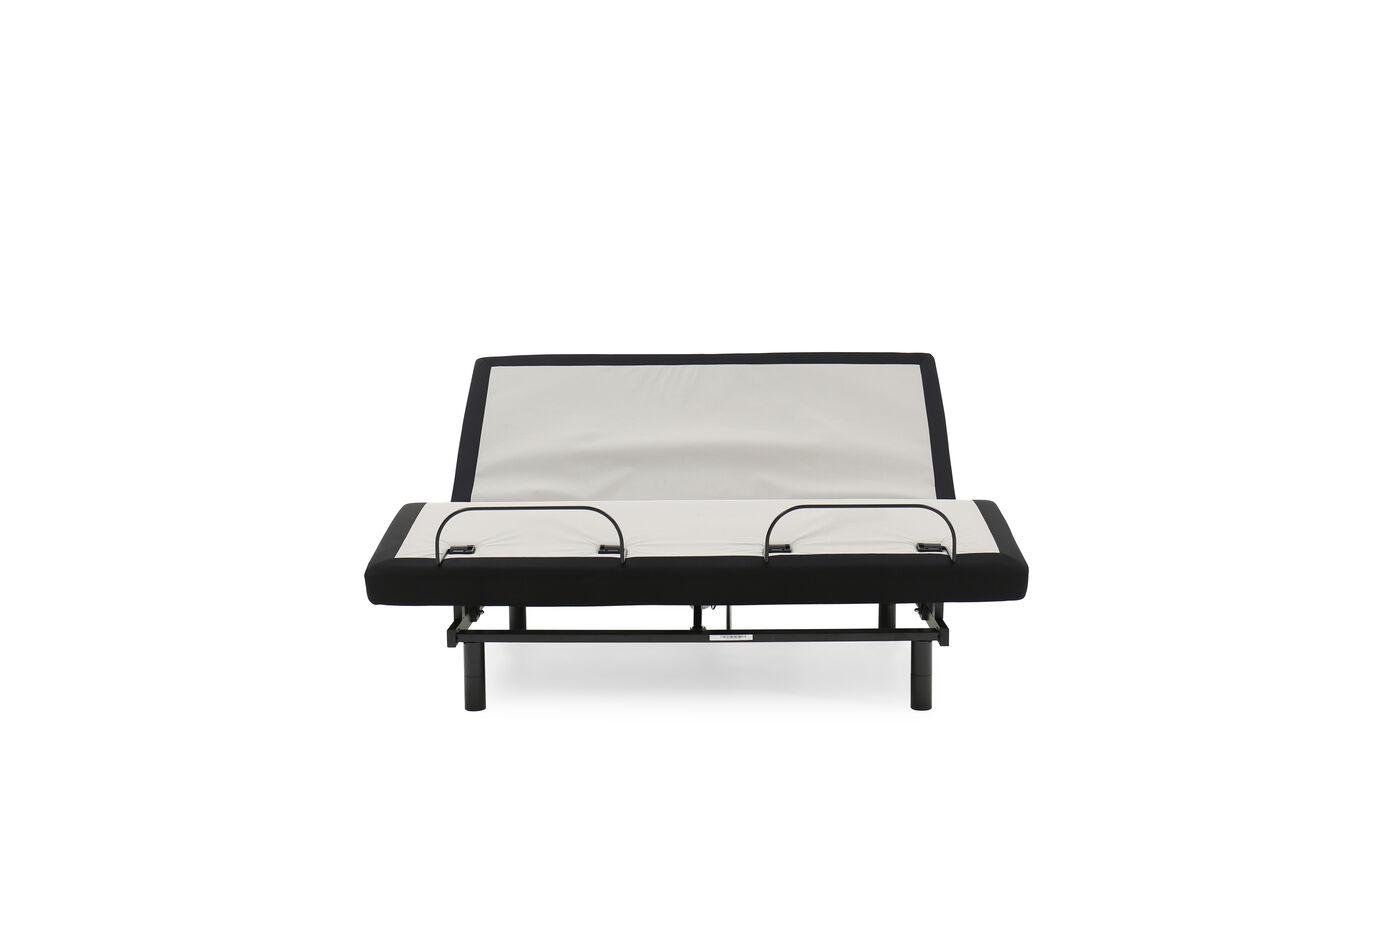 lady americana vivacity adjustable base mathis brothers furniture